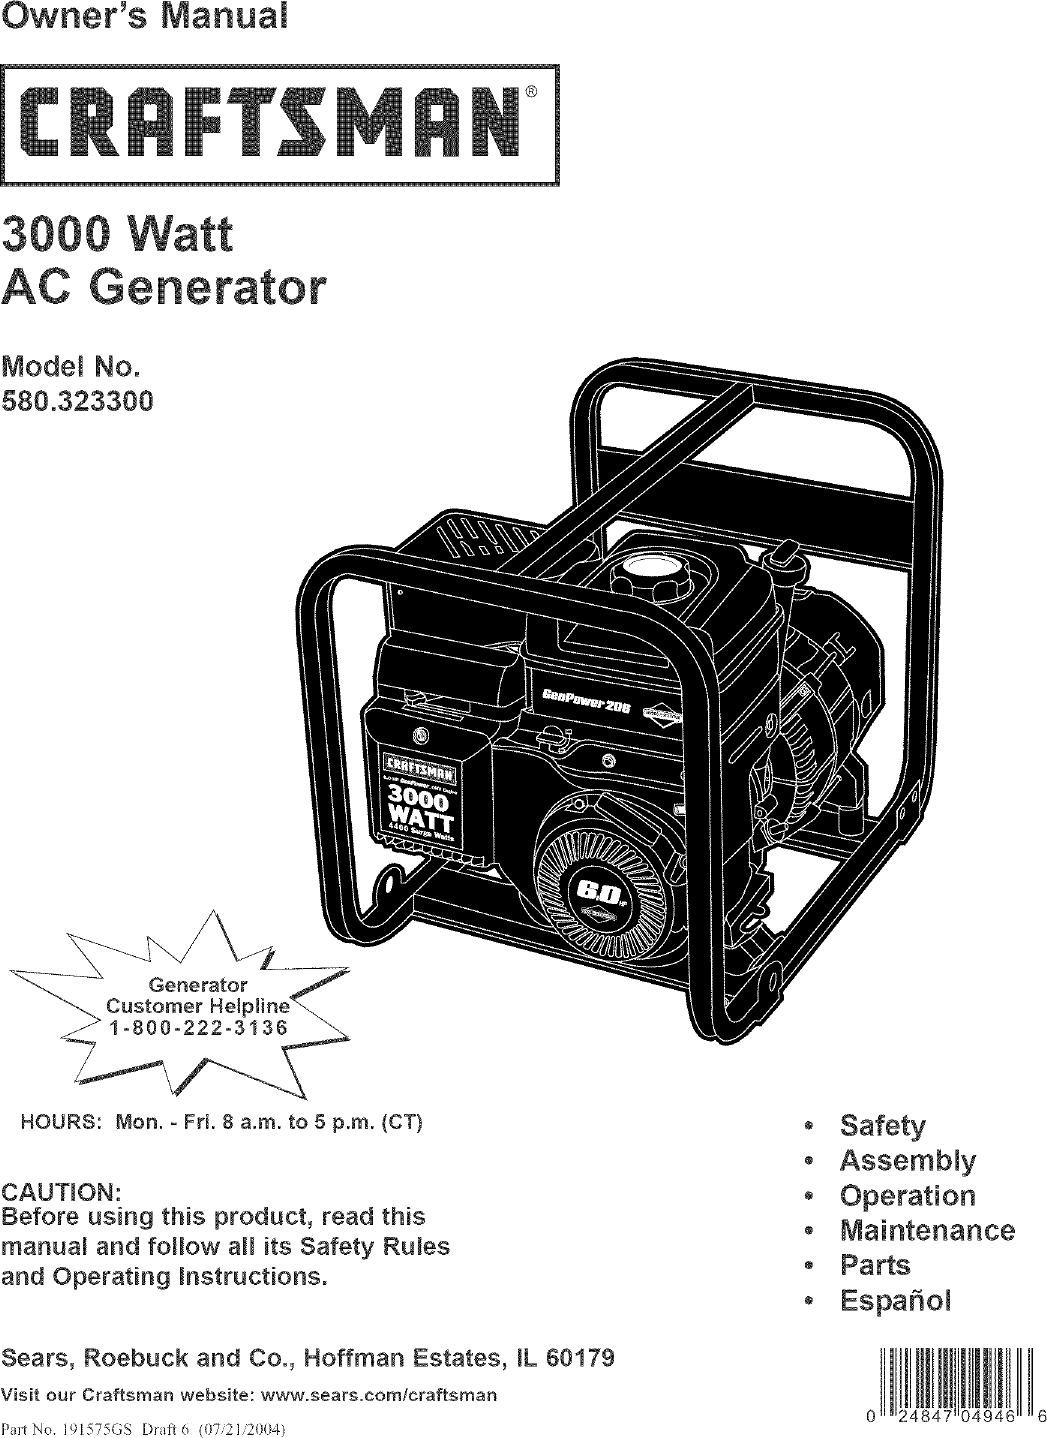 craftsman 580323300 user manual generator manuals and guides l0408295Craftsman Generator Wiring Diagram Parts Model 580323300 #6